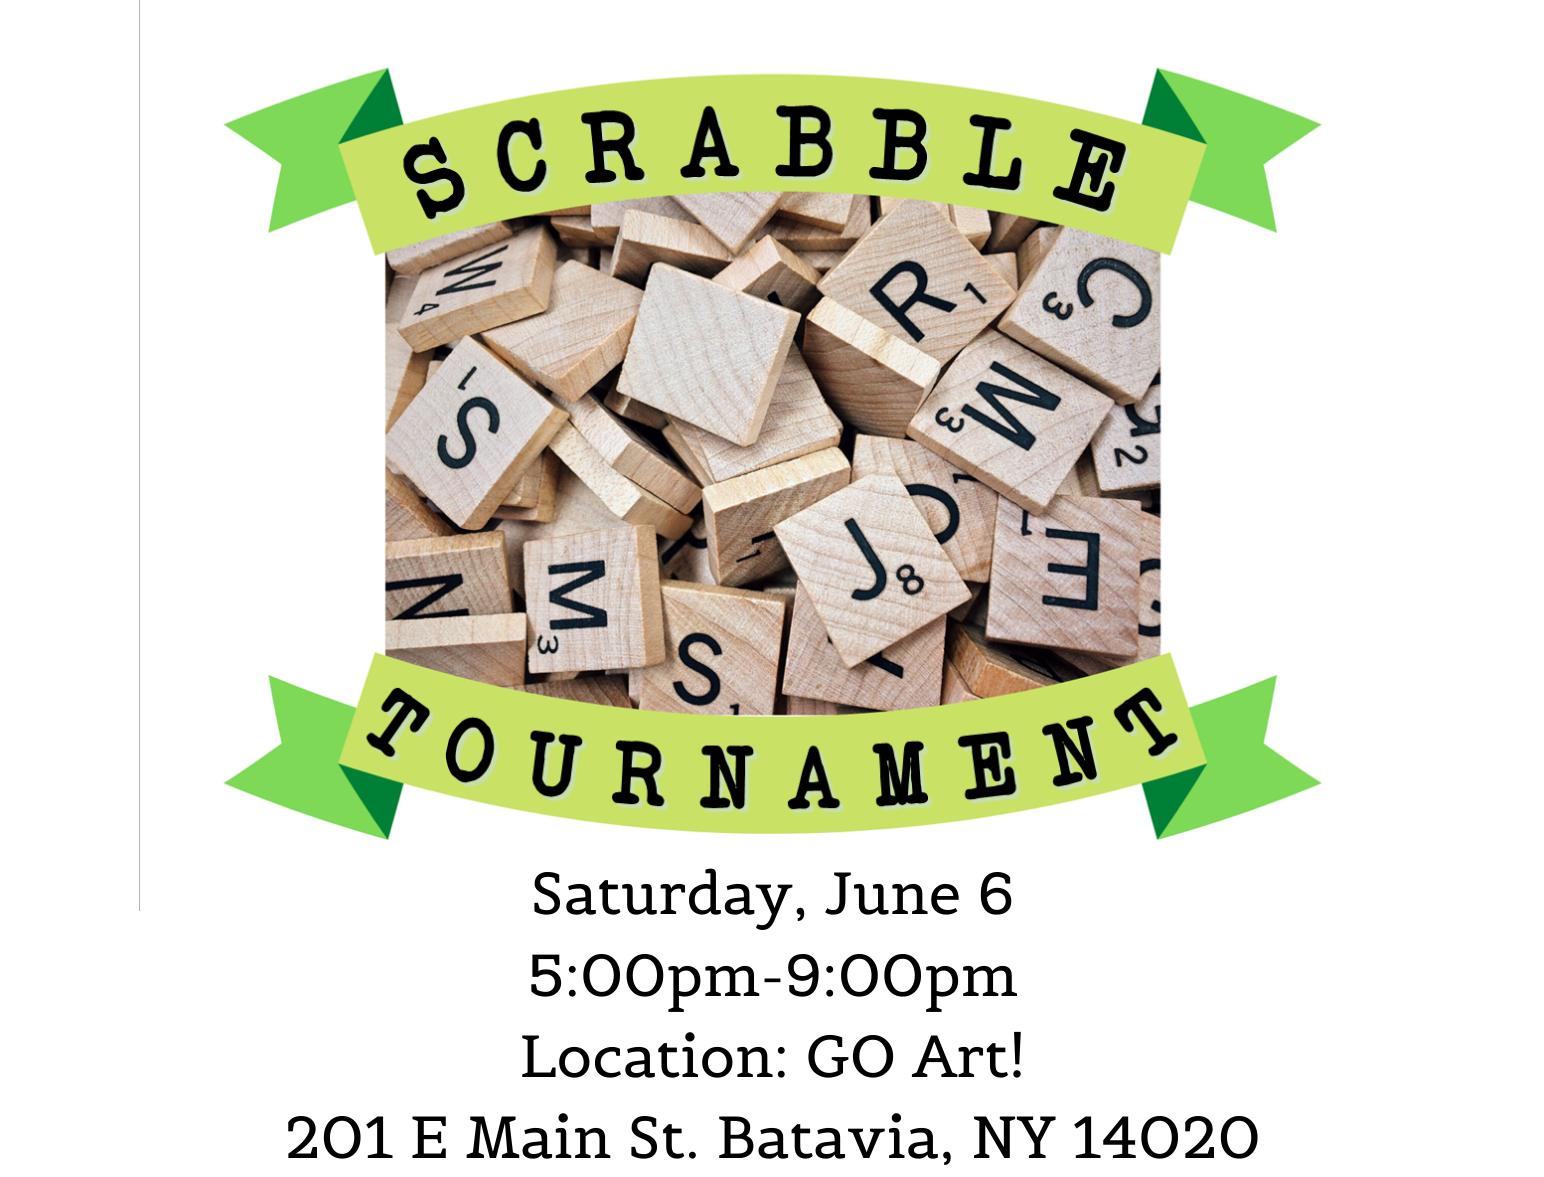 Scrabble Tournament Fundraiser